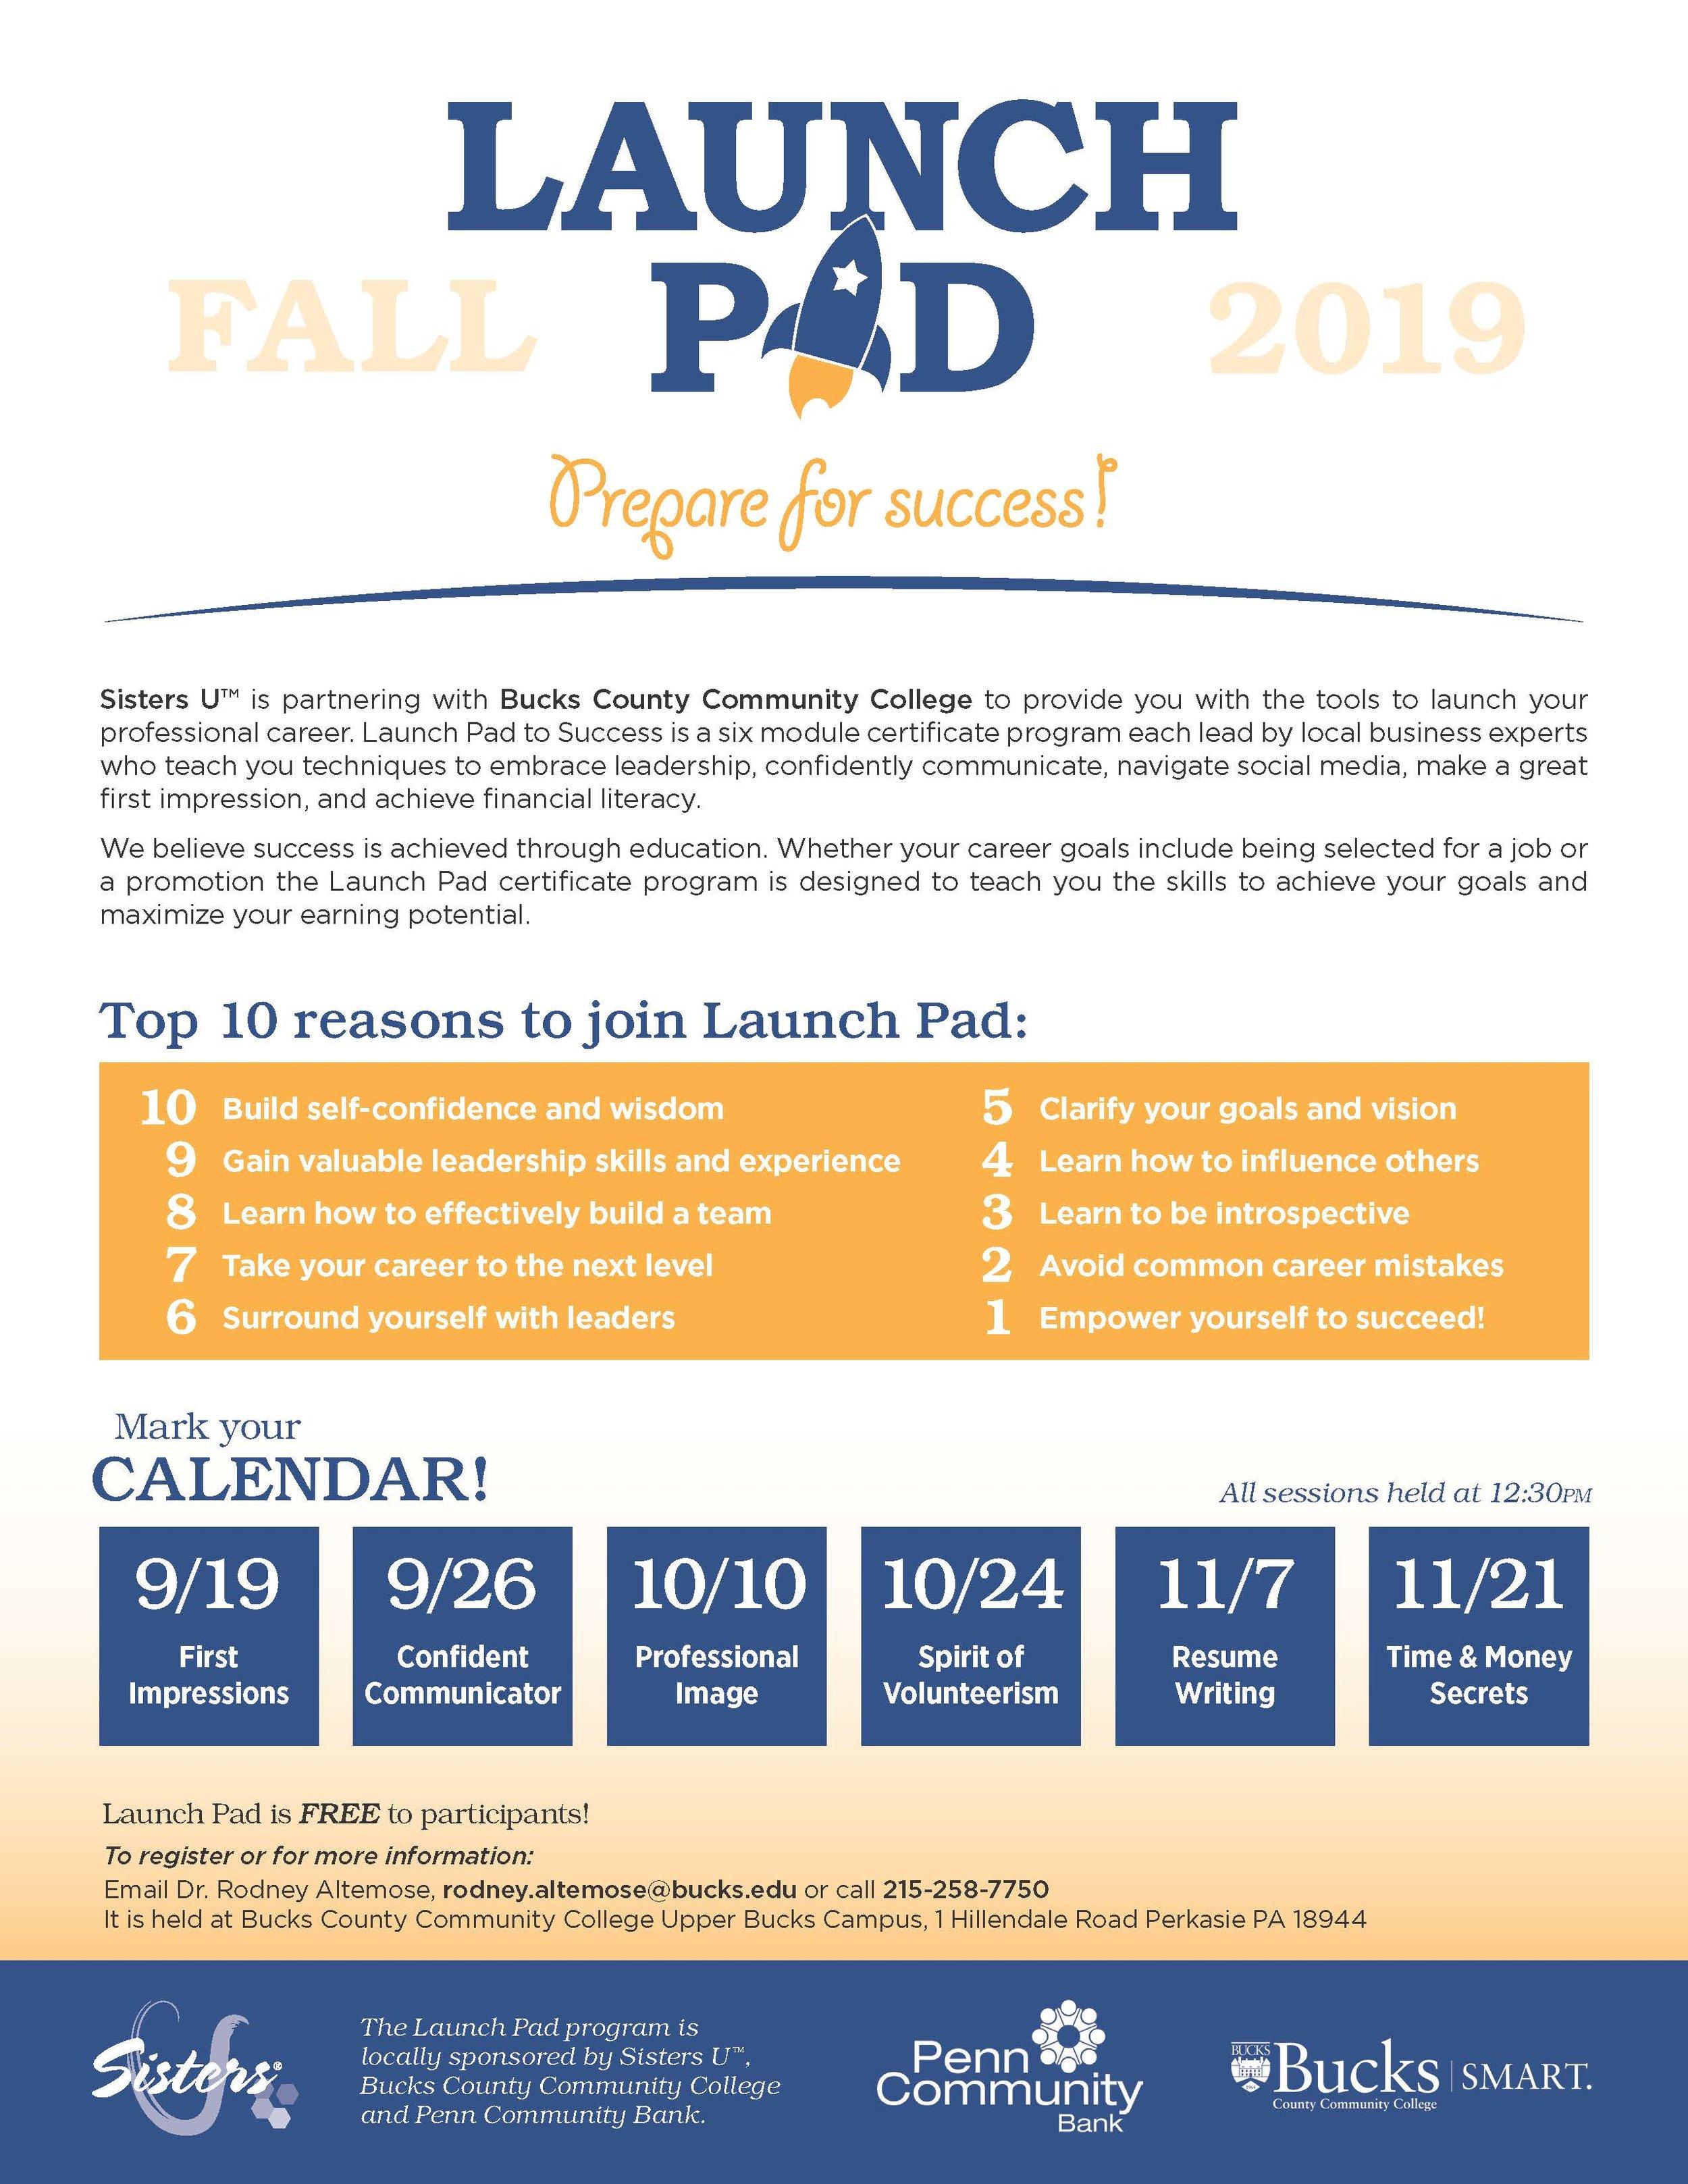 Launch Pad Fall 2019 no crops print ready_Page_1.jpg